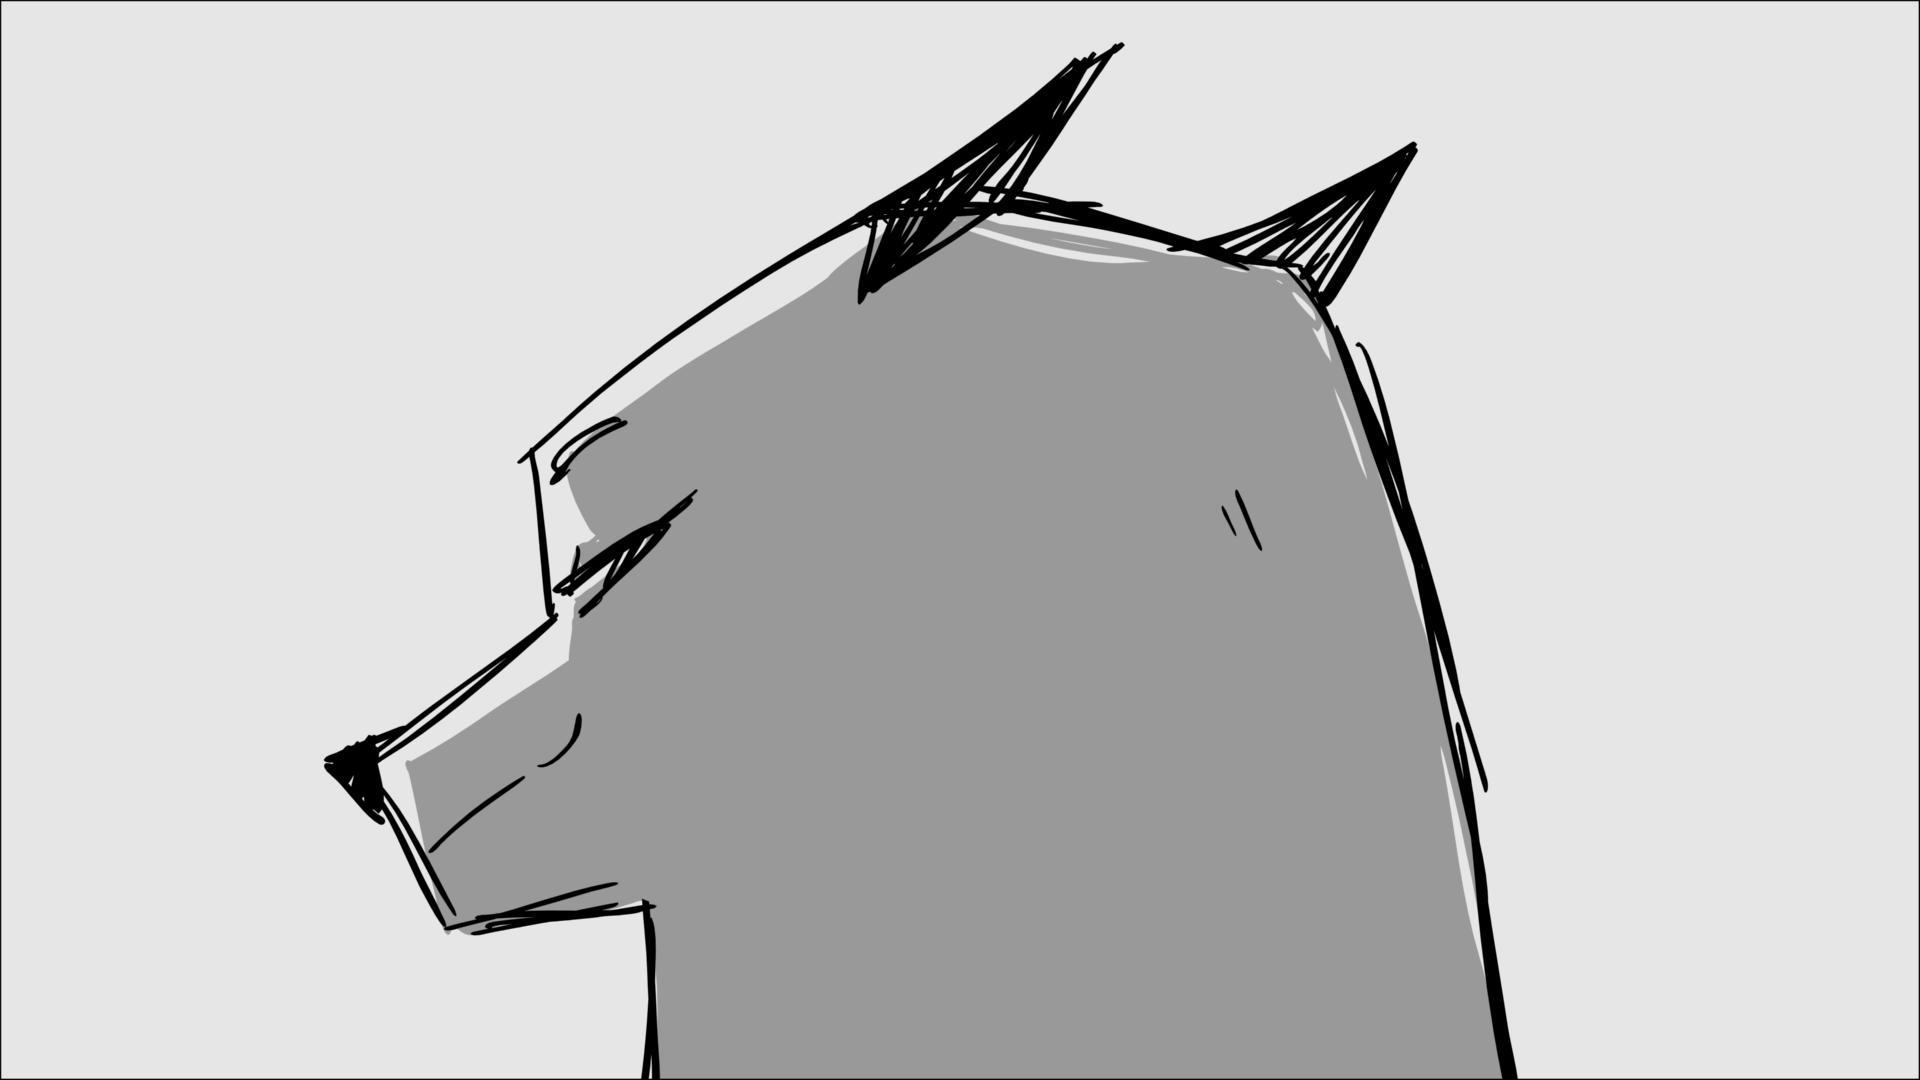 Blades of Furry-000024-03.jpg